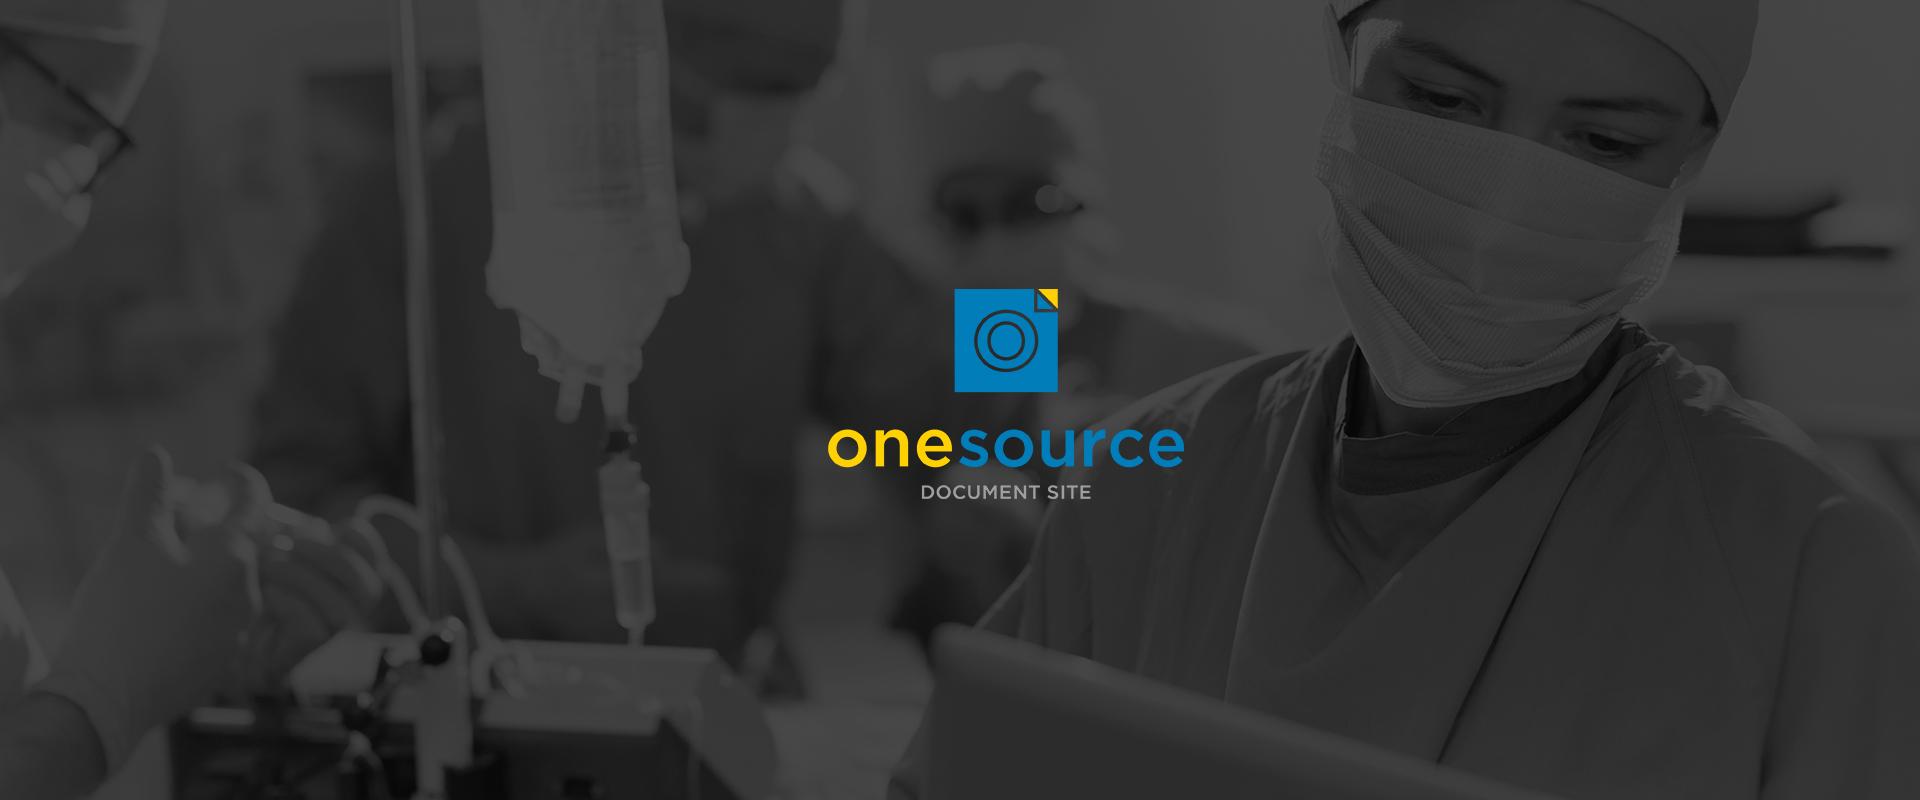 oneSOURCE_CoverImage.jpg